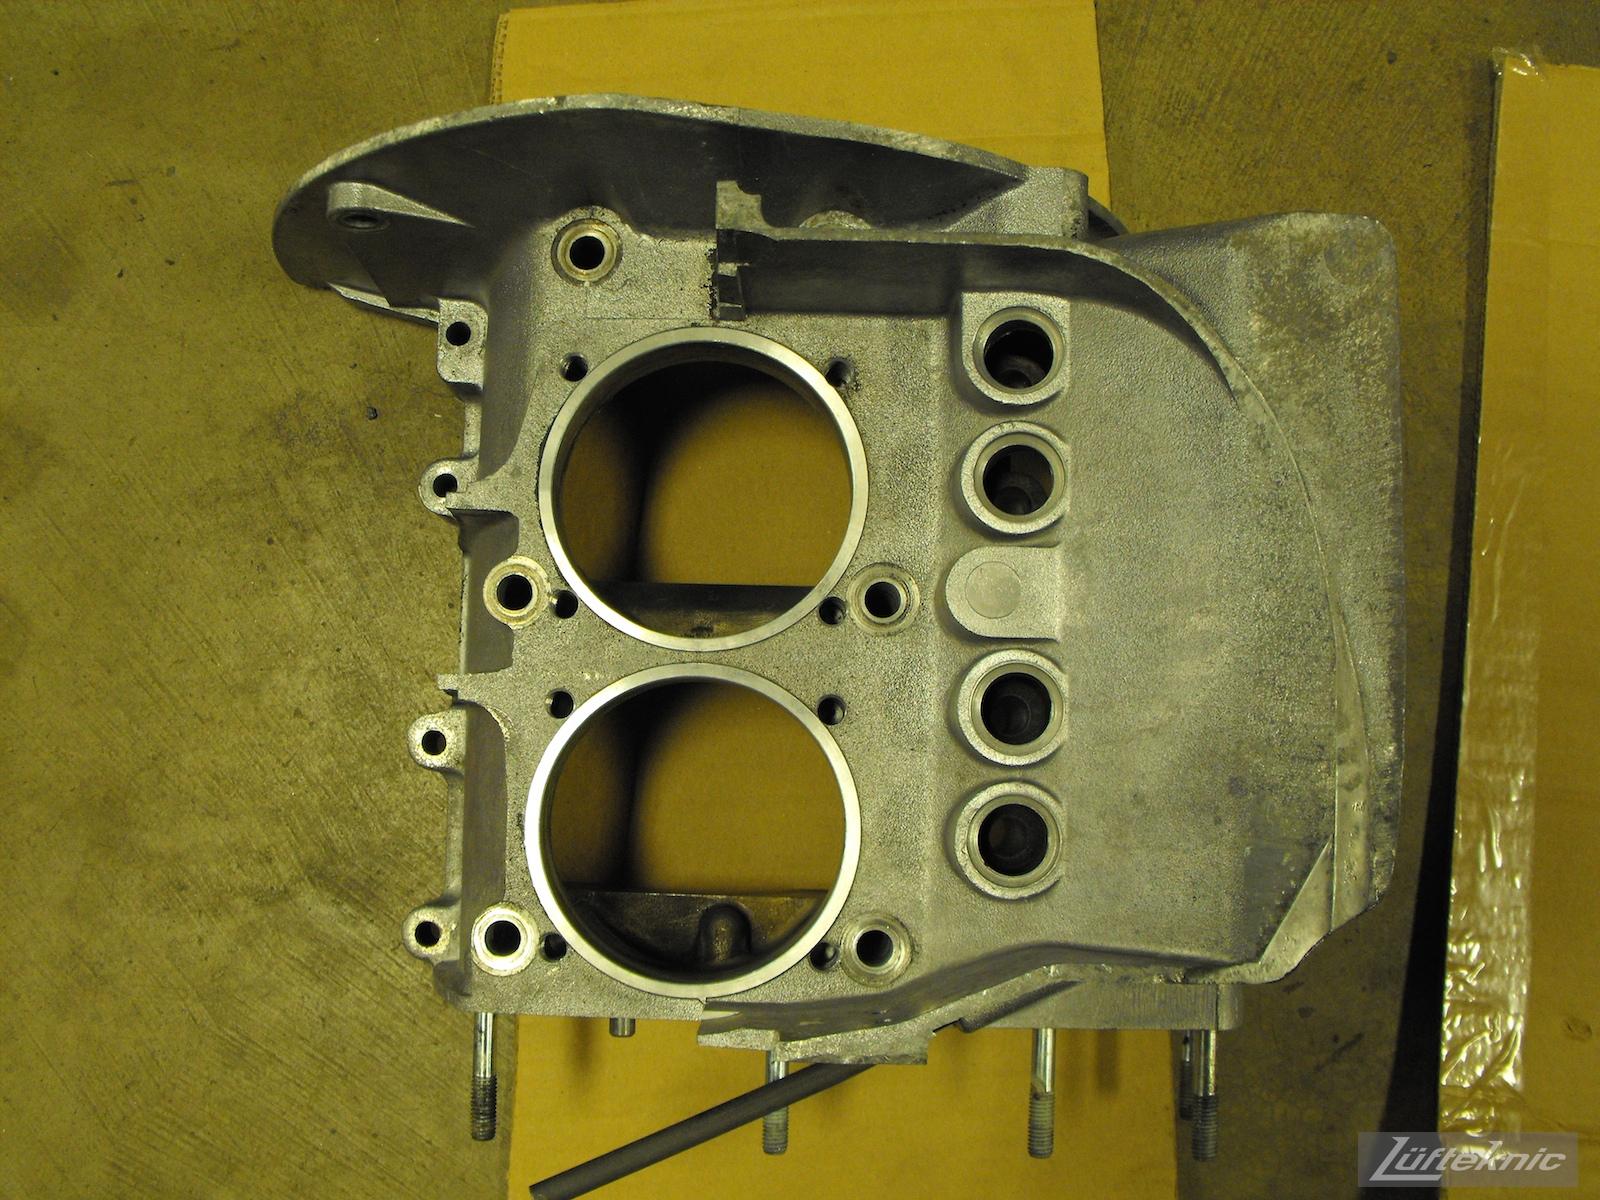 Engine case for a 1961 Porsche 356B Roadster restoration.